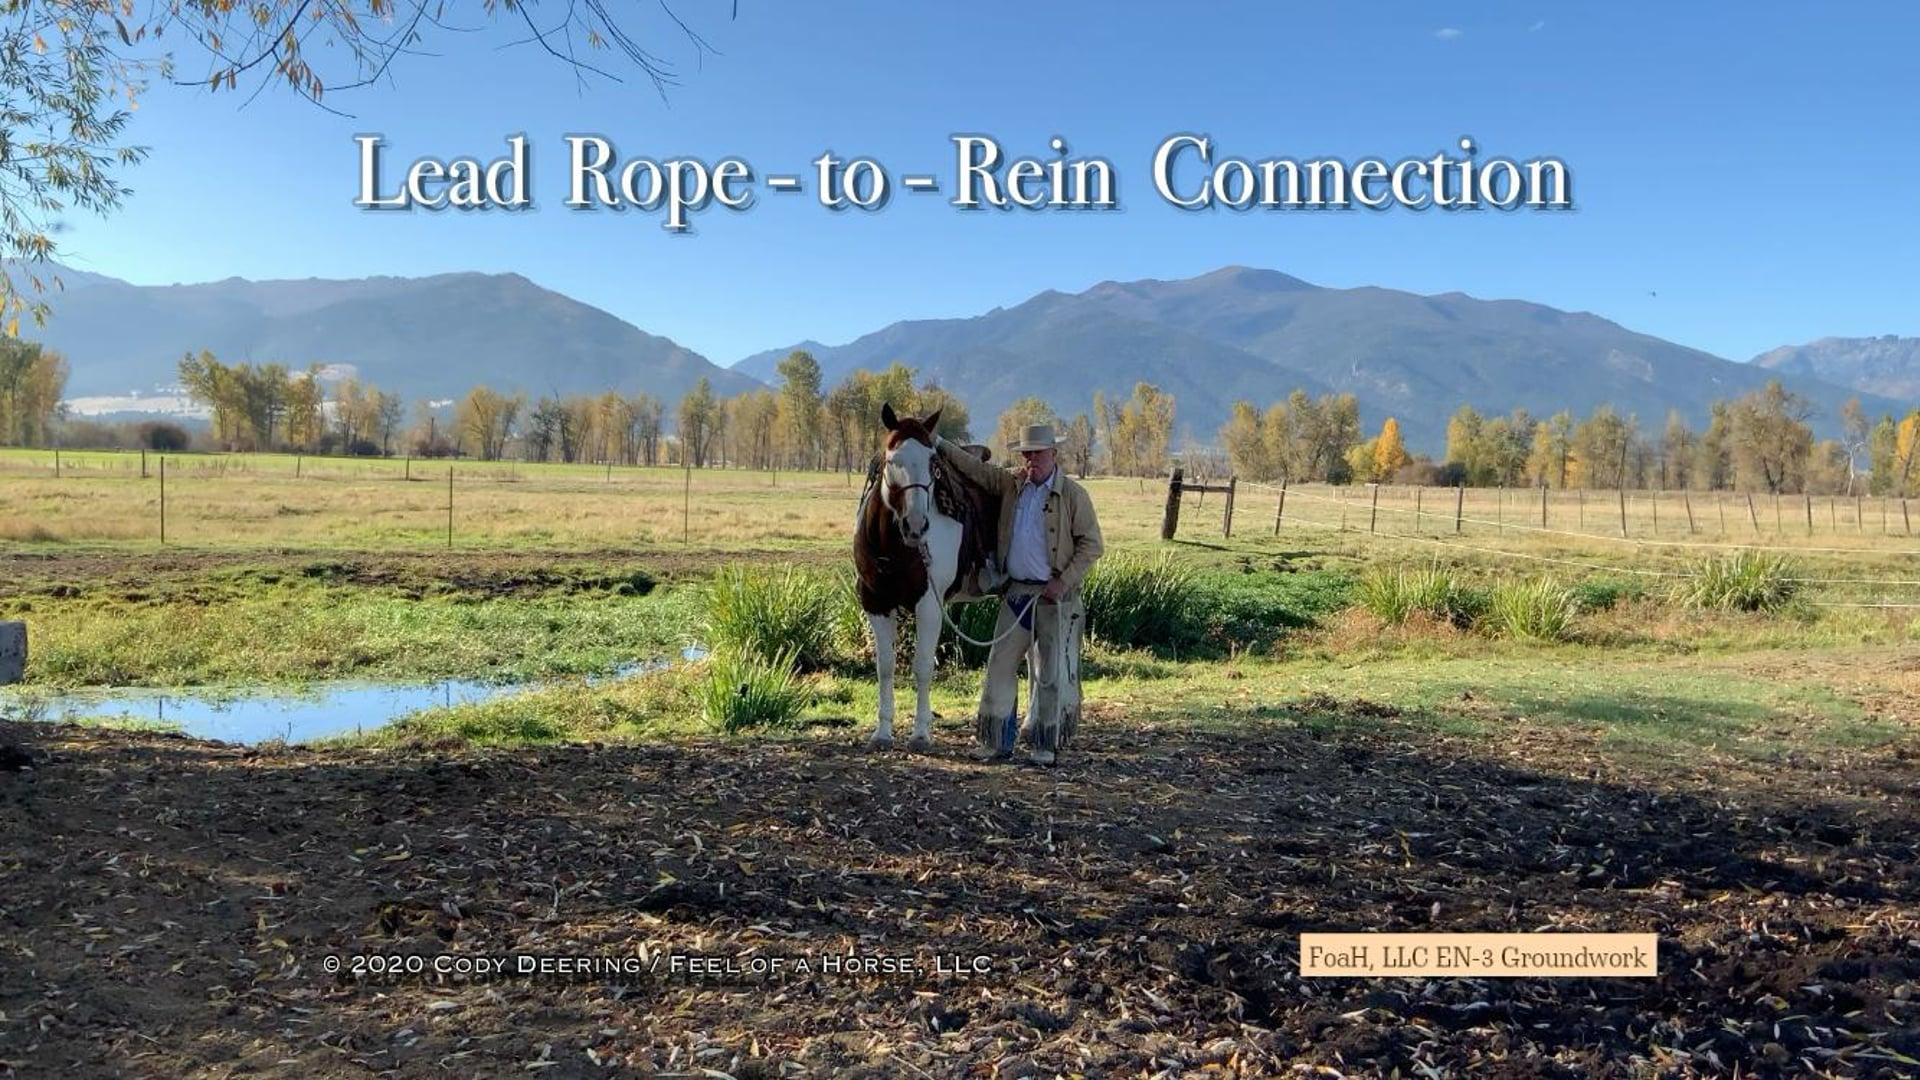 EN-3 The Lead Rope-to-Rein Connection / Cody Deering